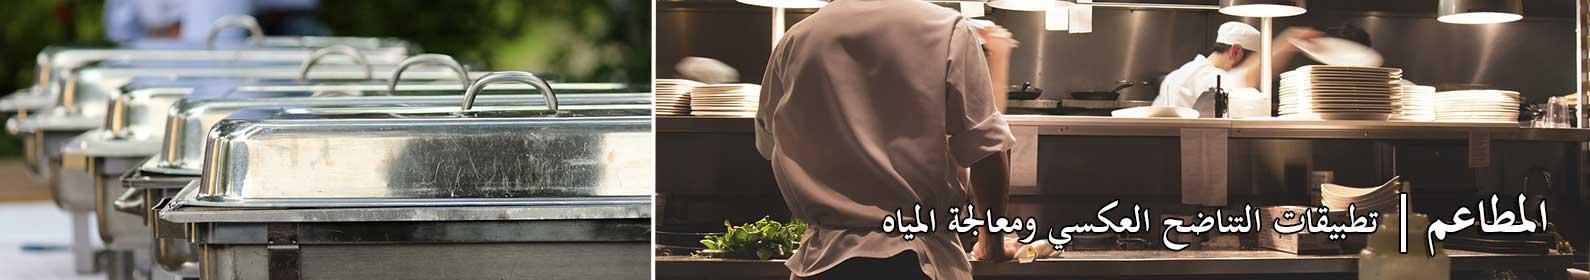 -restaurant-industry.jpg